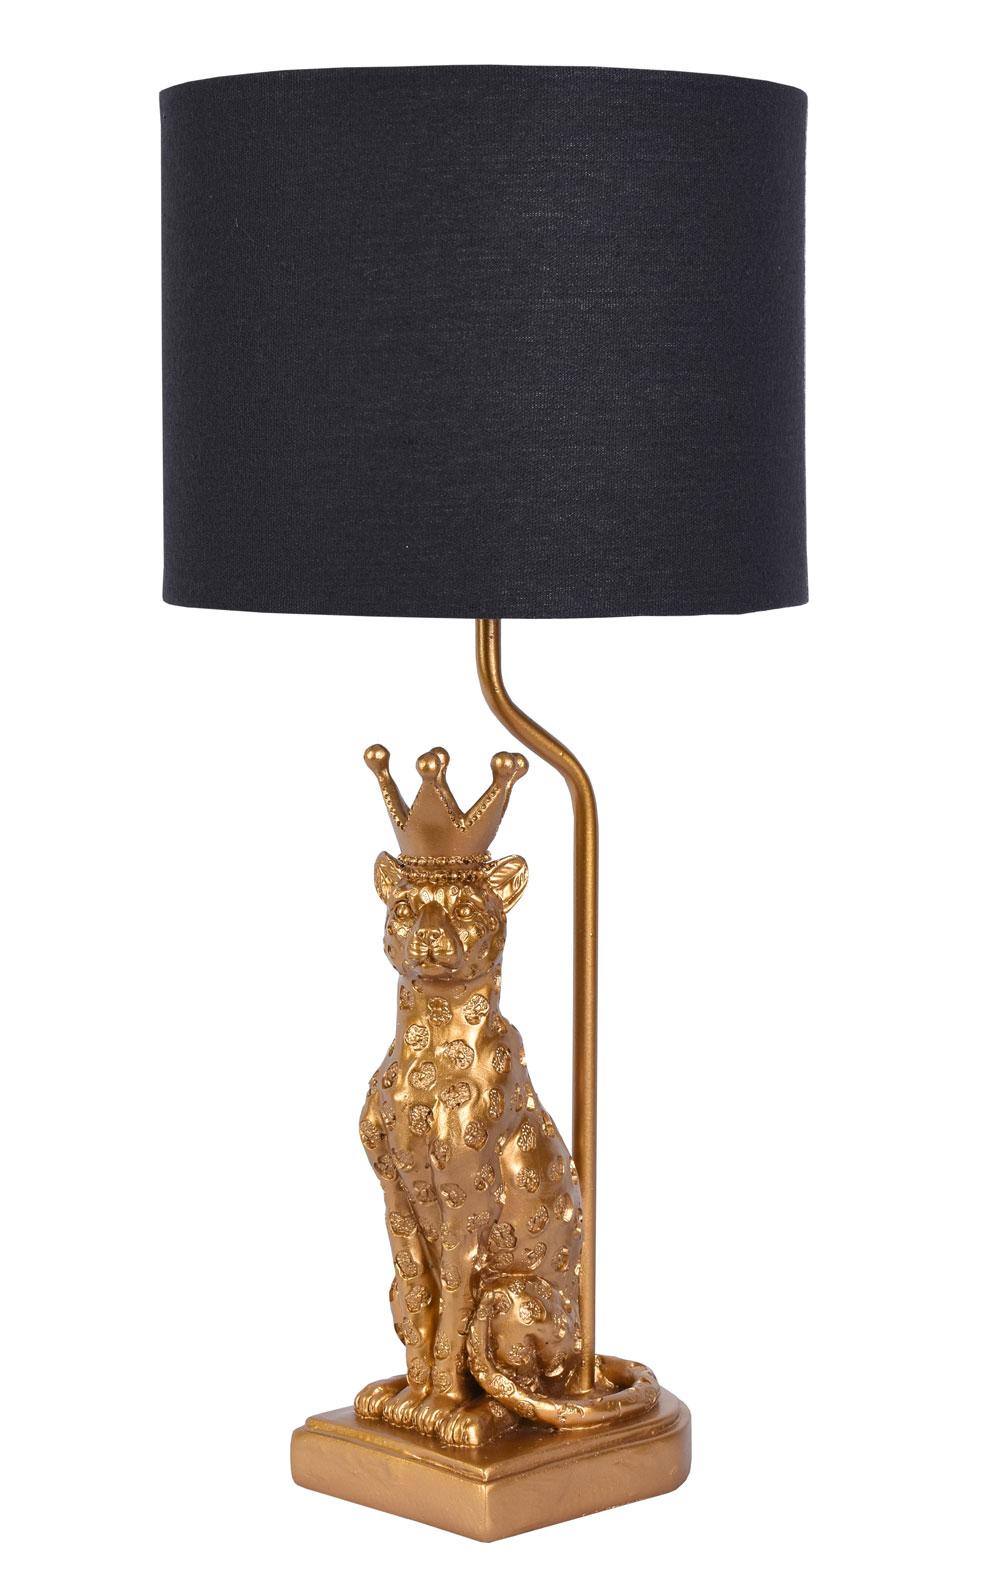 Lampada Figura Animale Luce Panther Lampada Da Tavolo Oro Luce Leo Con Corona Ebay